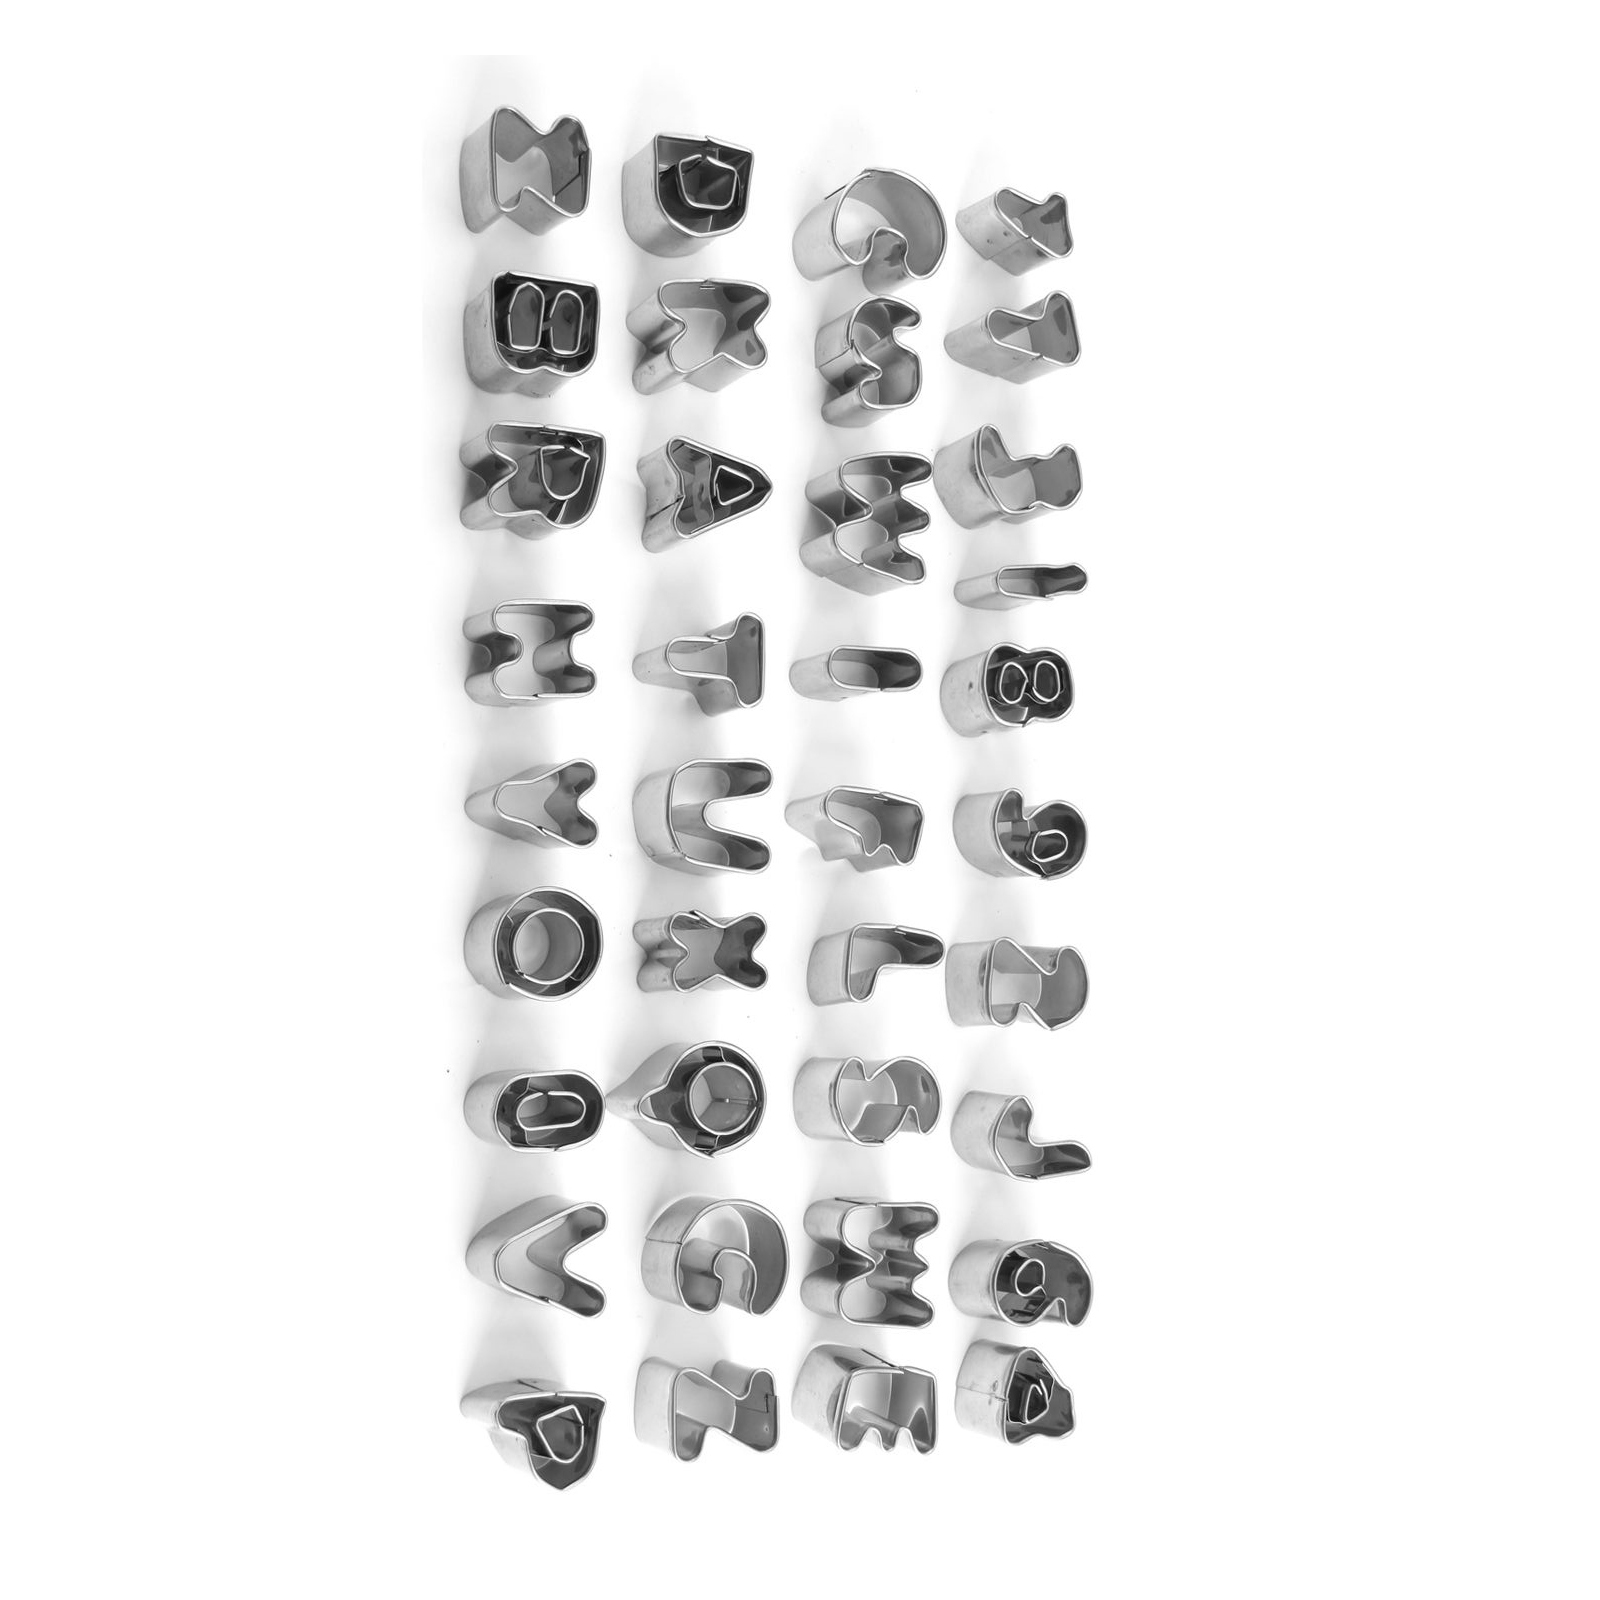 Cake Decorating Letter Cubes : Alphabet Number Letter Cake Decorating Set Fondant Icing ...